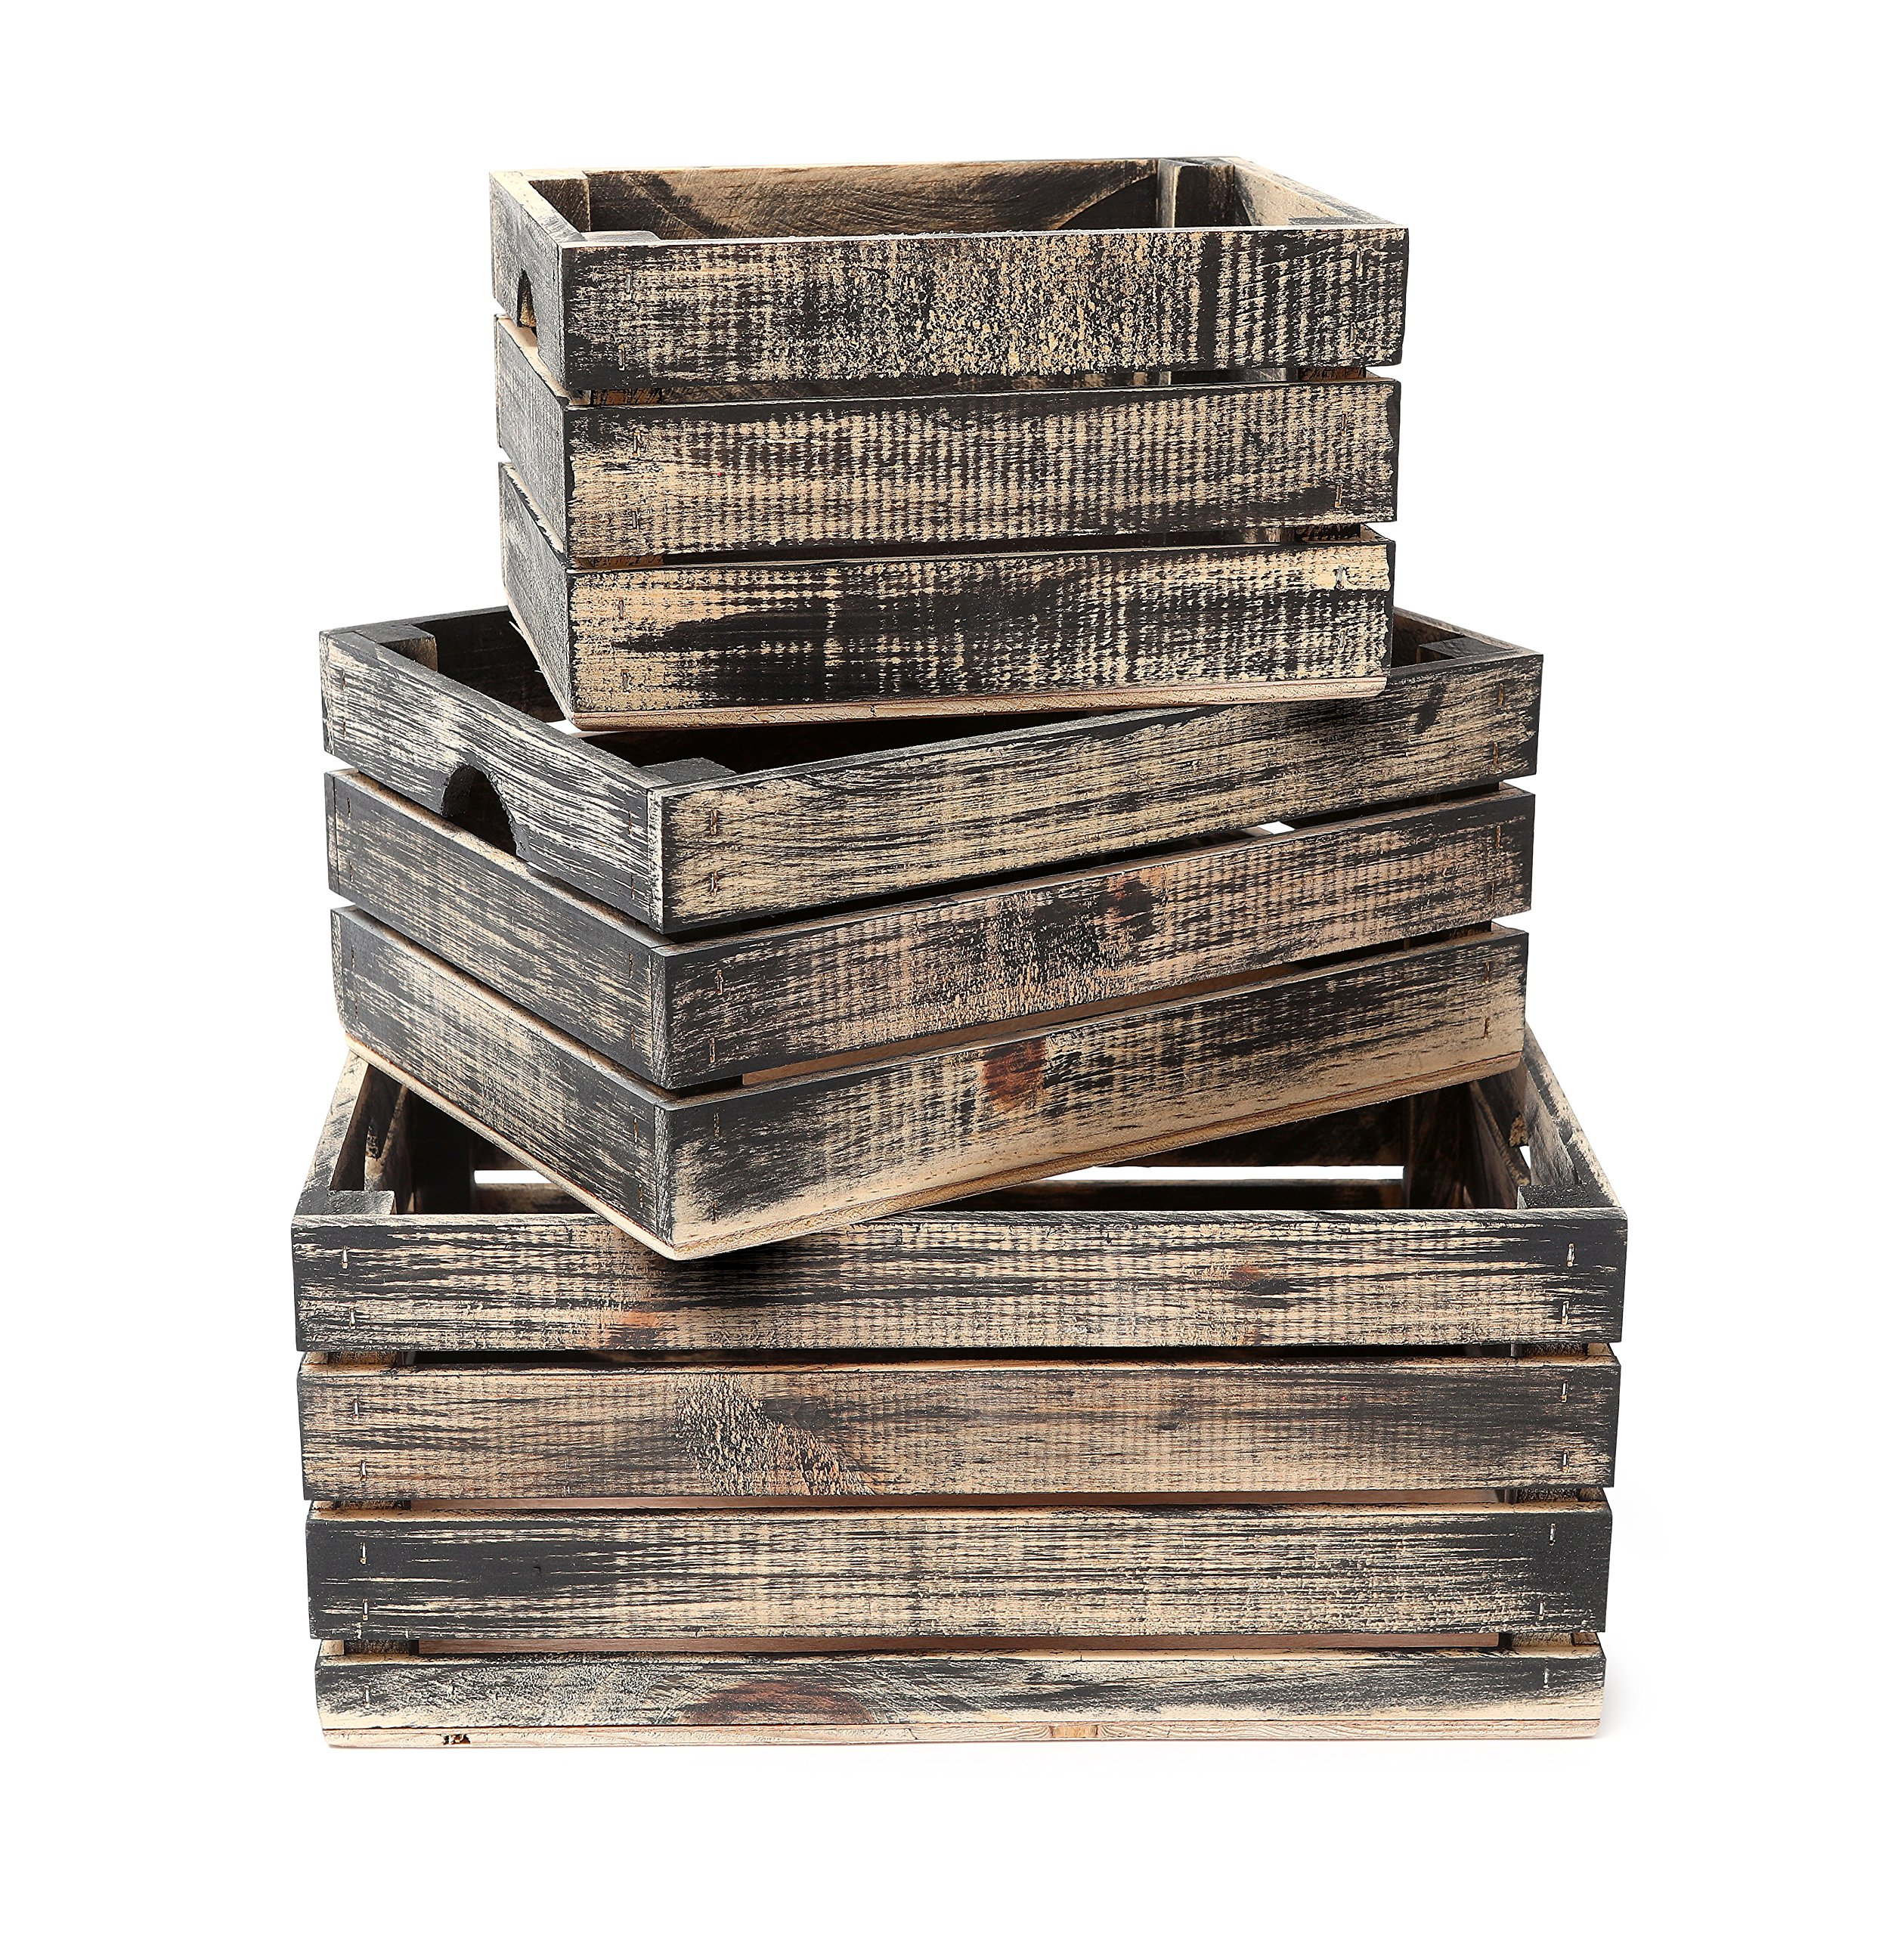 Rustic Decorative Wood Crates (Set of 3) (Black and Natural Distressed)